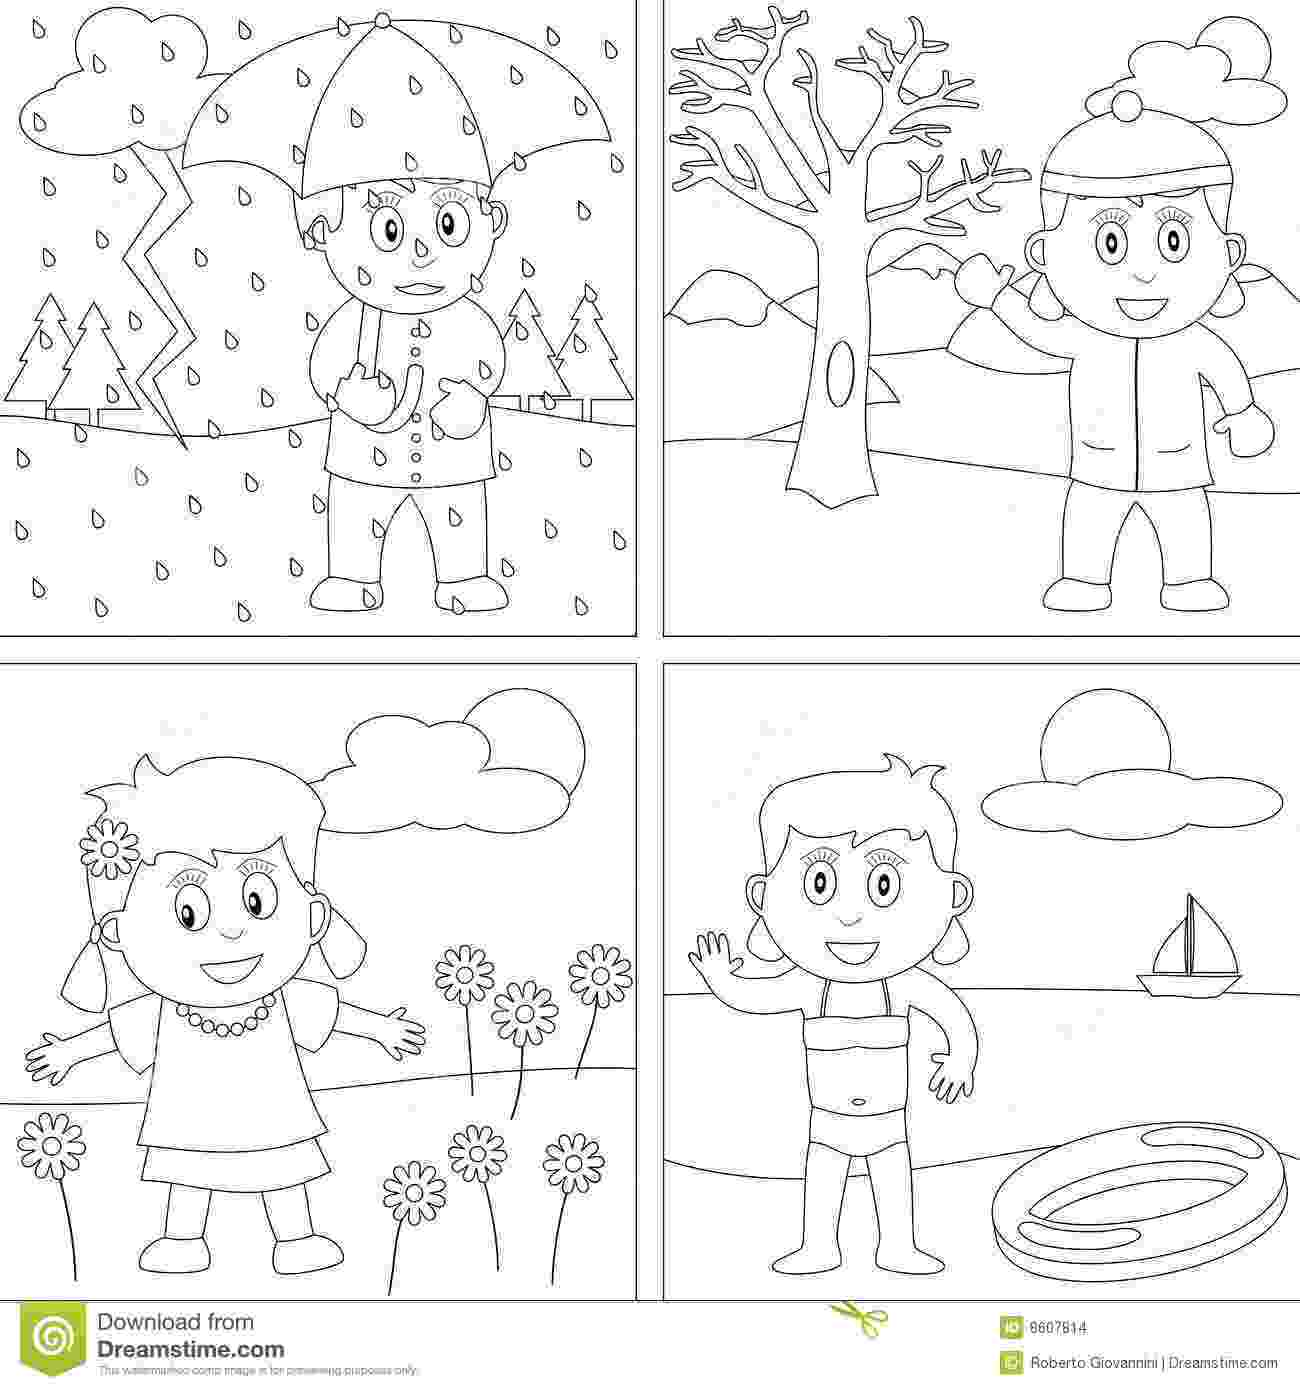 seasons coloring pages 4 seasons coloring pages sketch coloring page pages seasons coloring